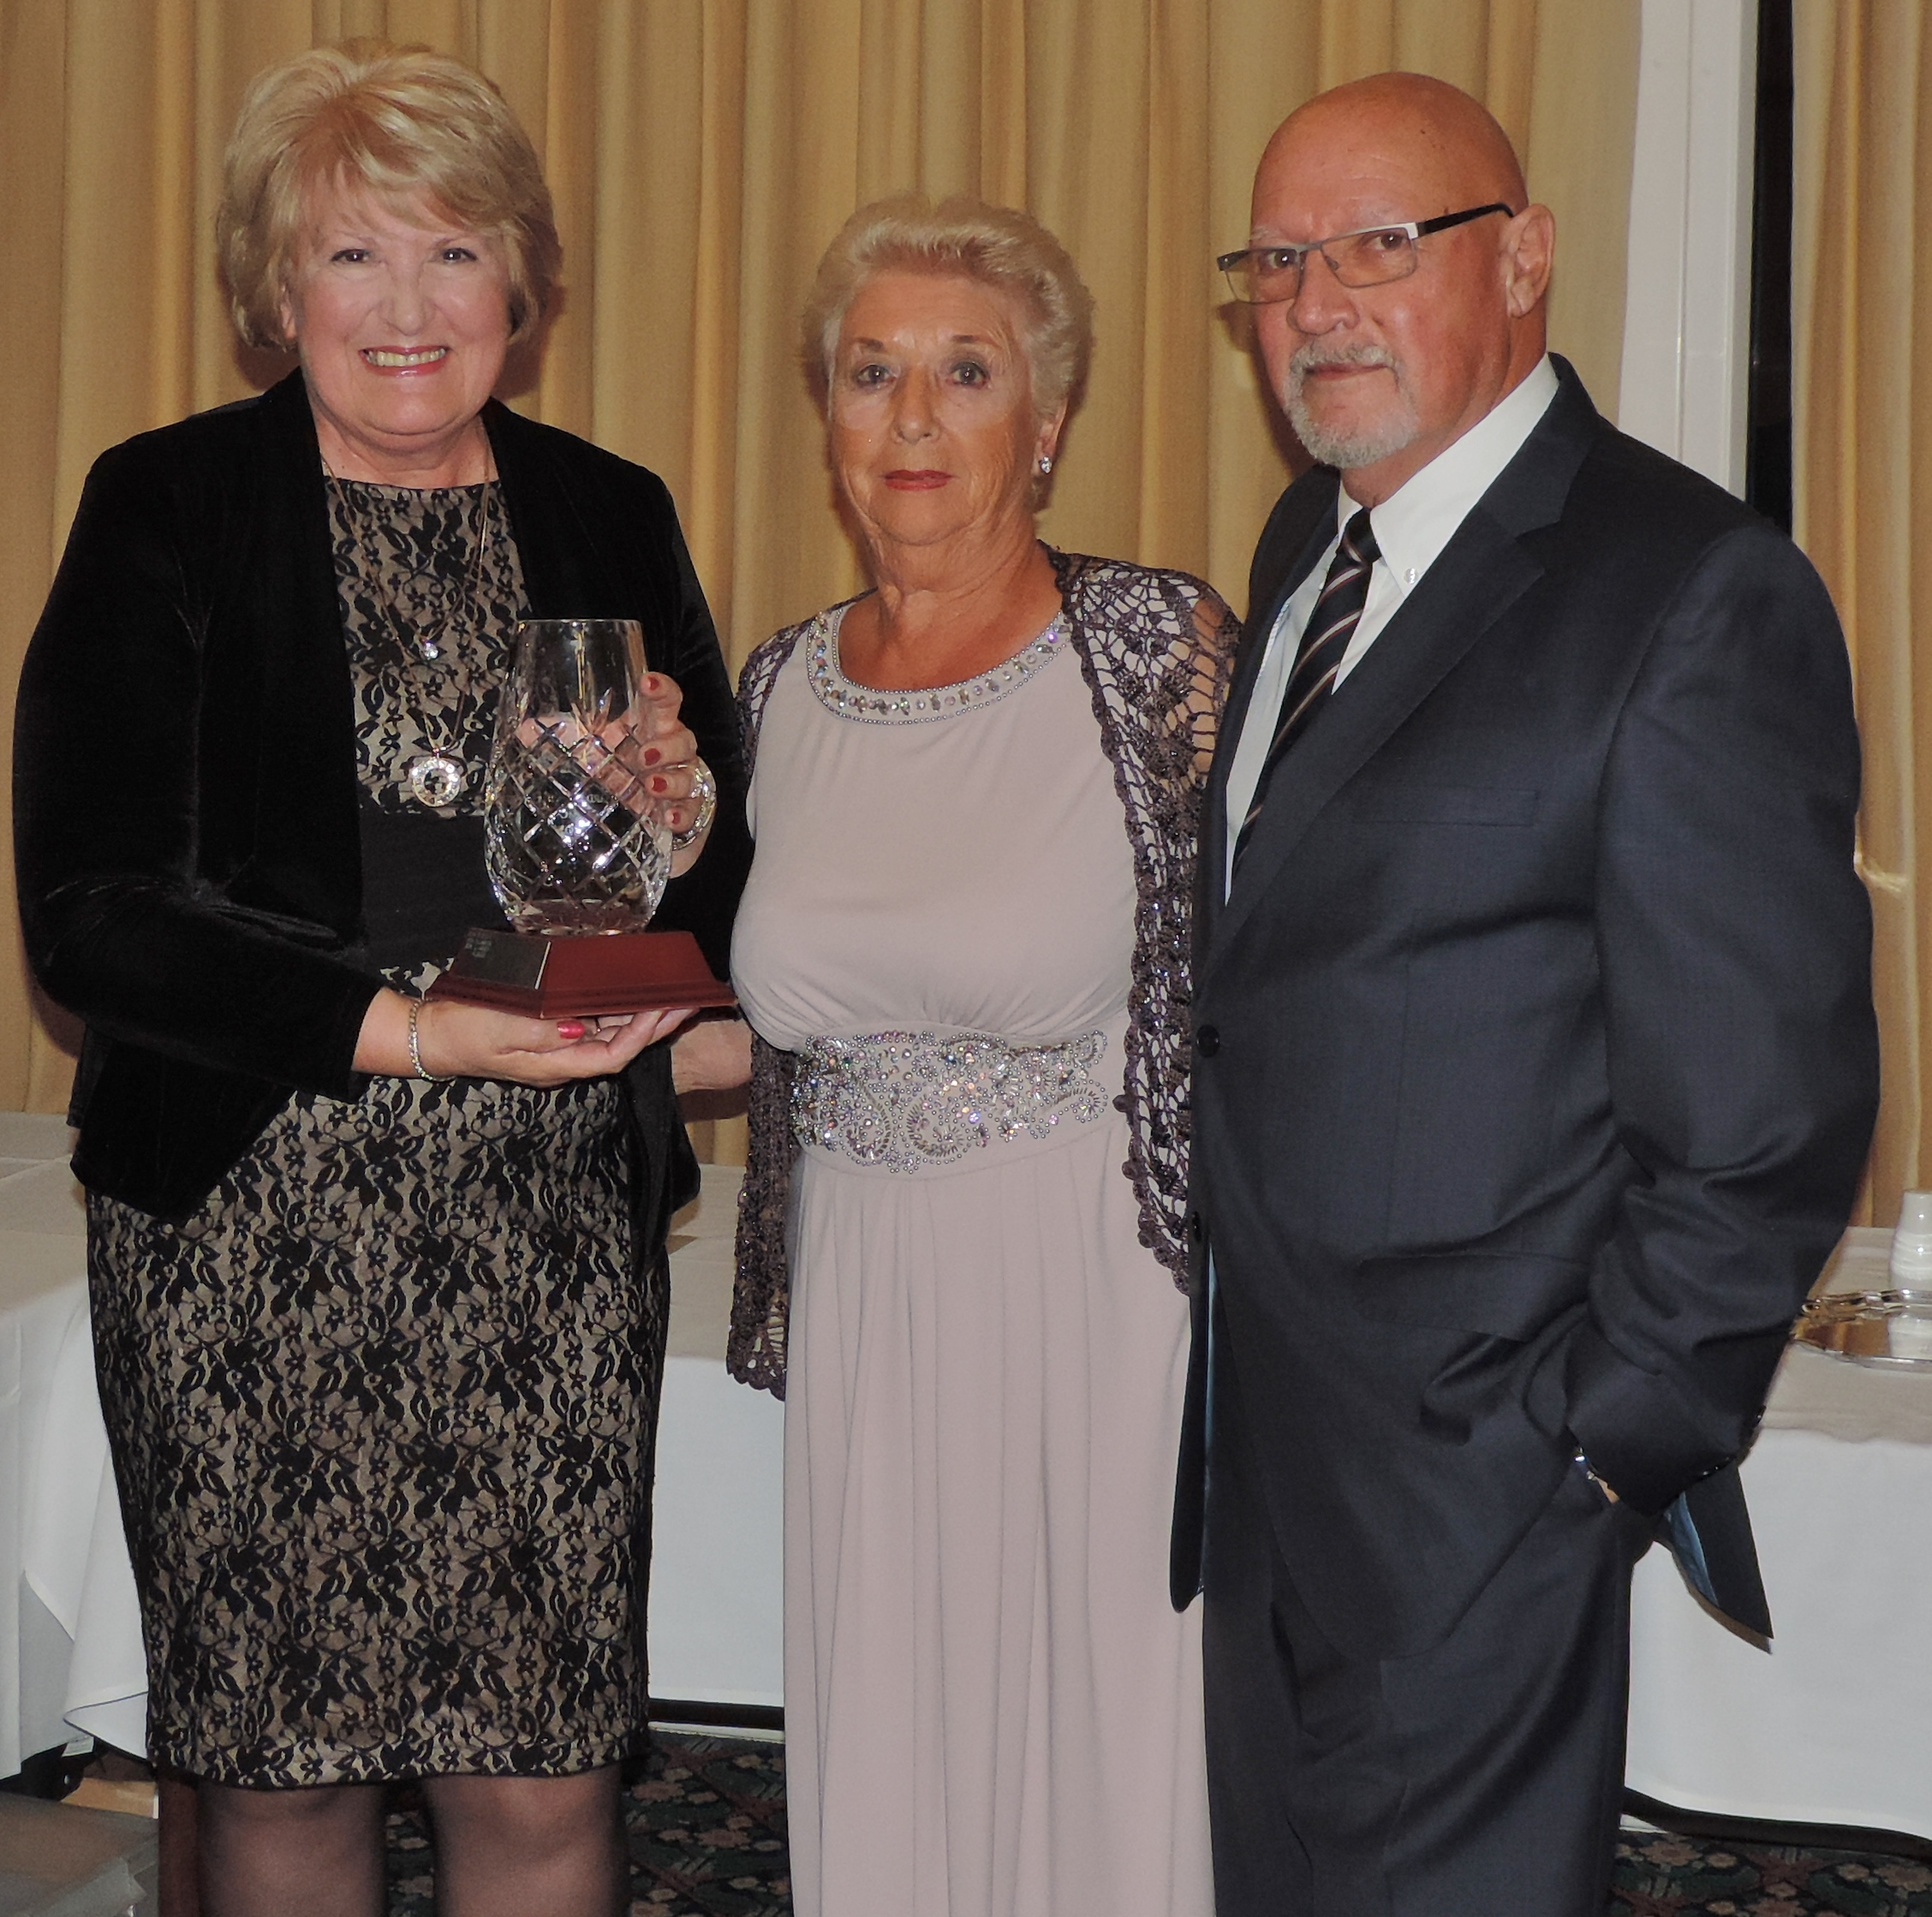 Barry Hubbard Vase Winners